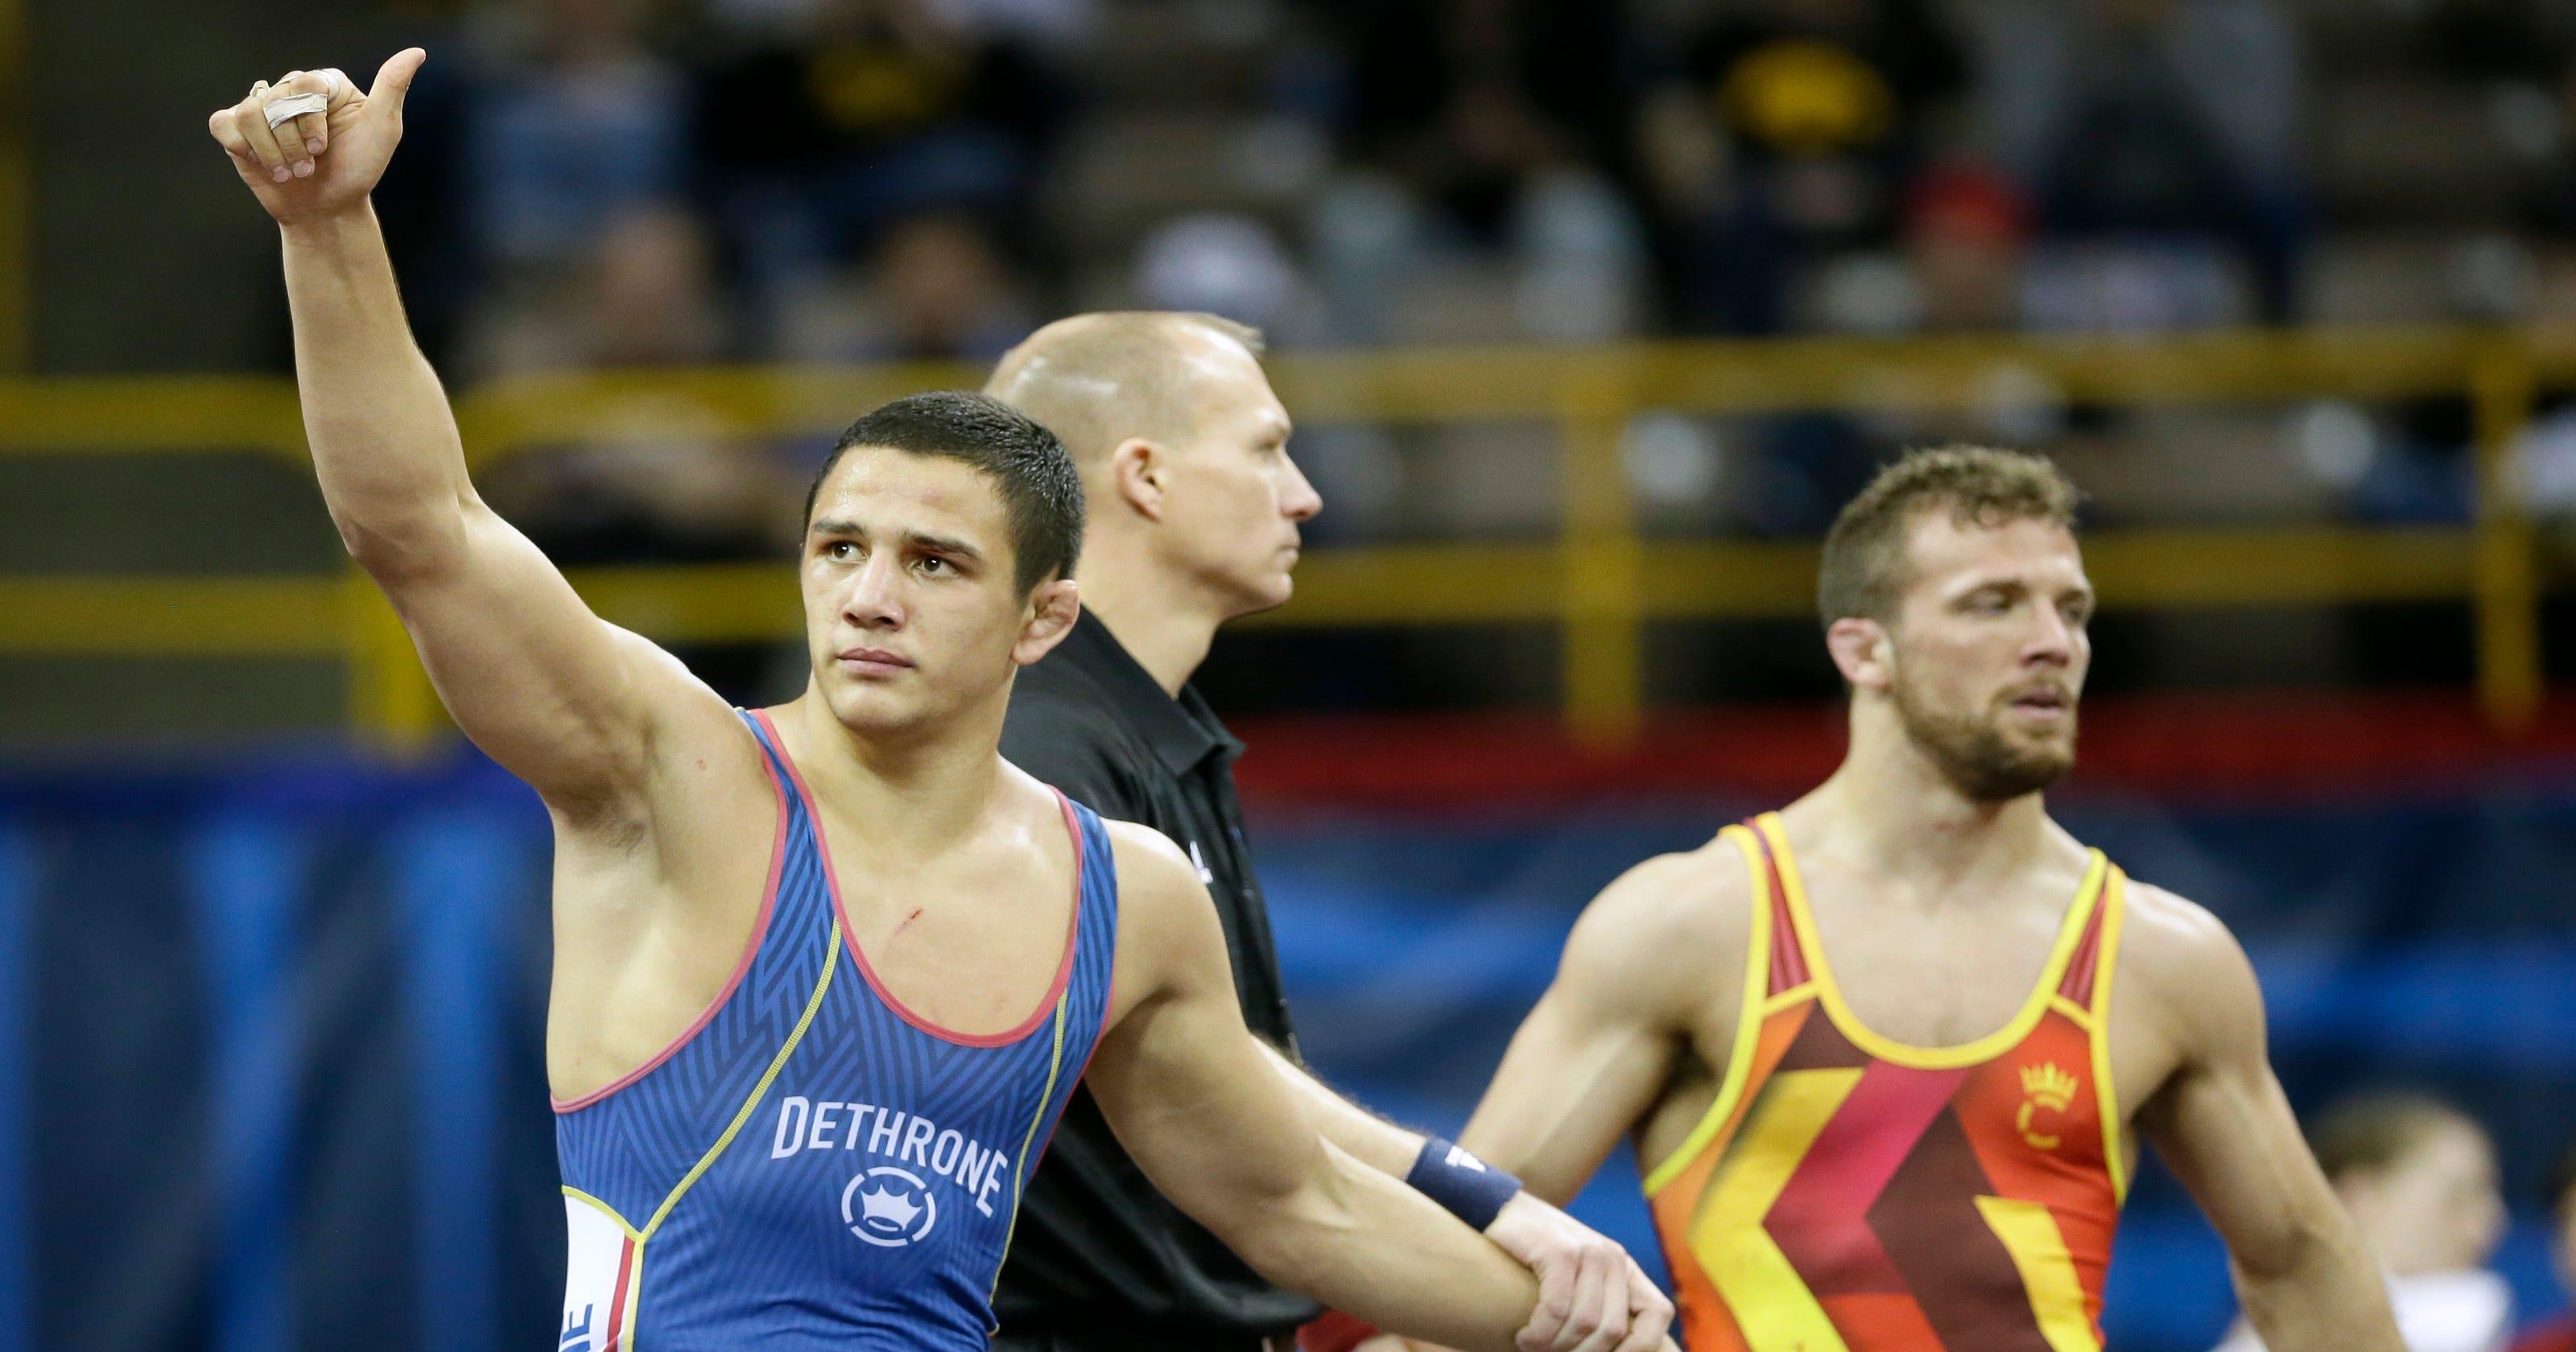 8c7e0233b8dd9a Heartbreak for Hoosiers at Olympic wrestling trials